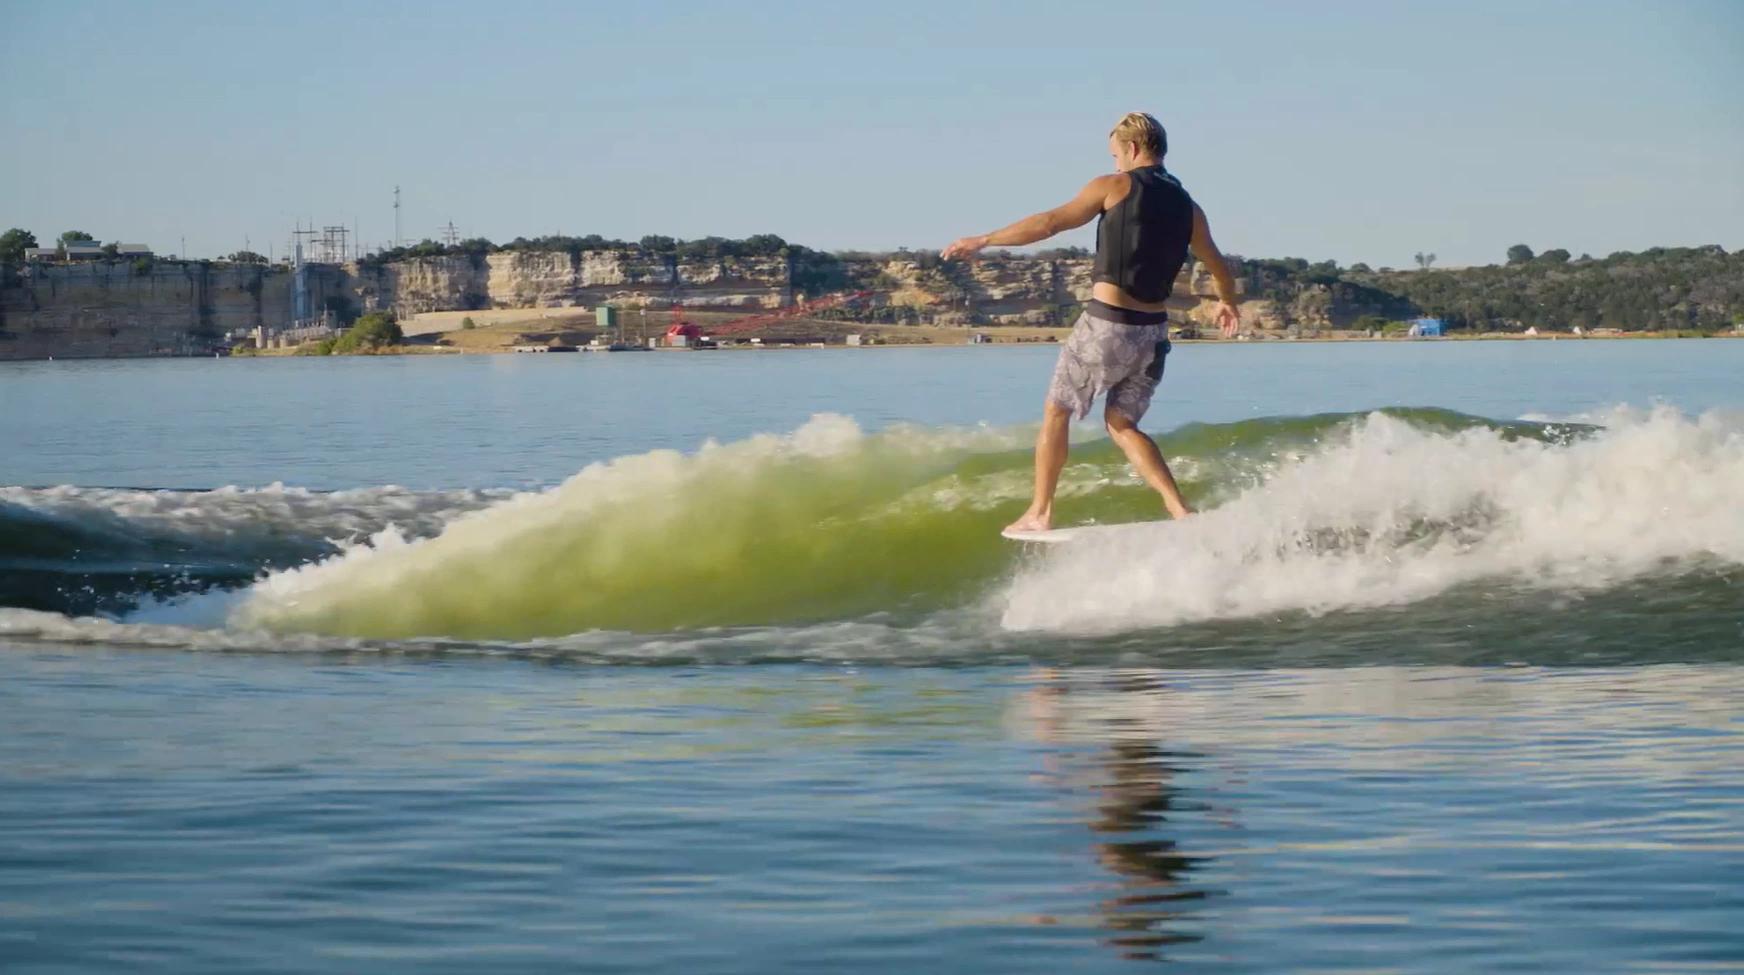 surf technique training boat wave longboard hang 5